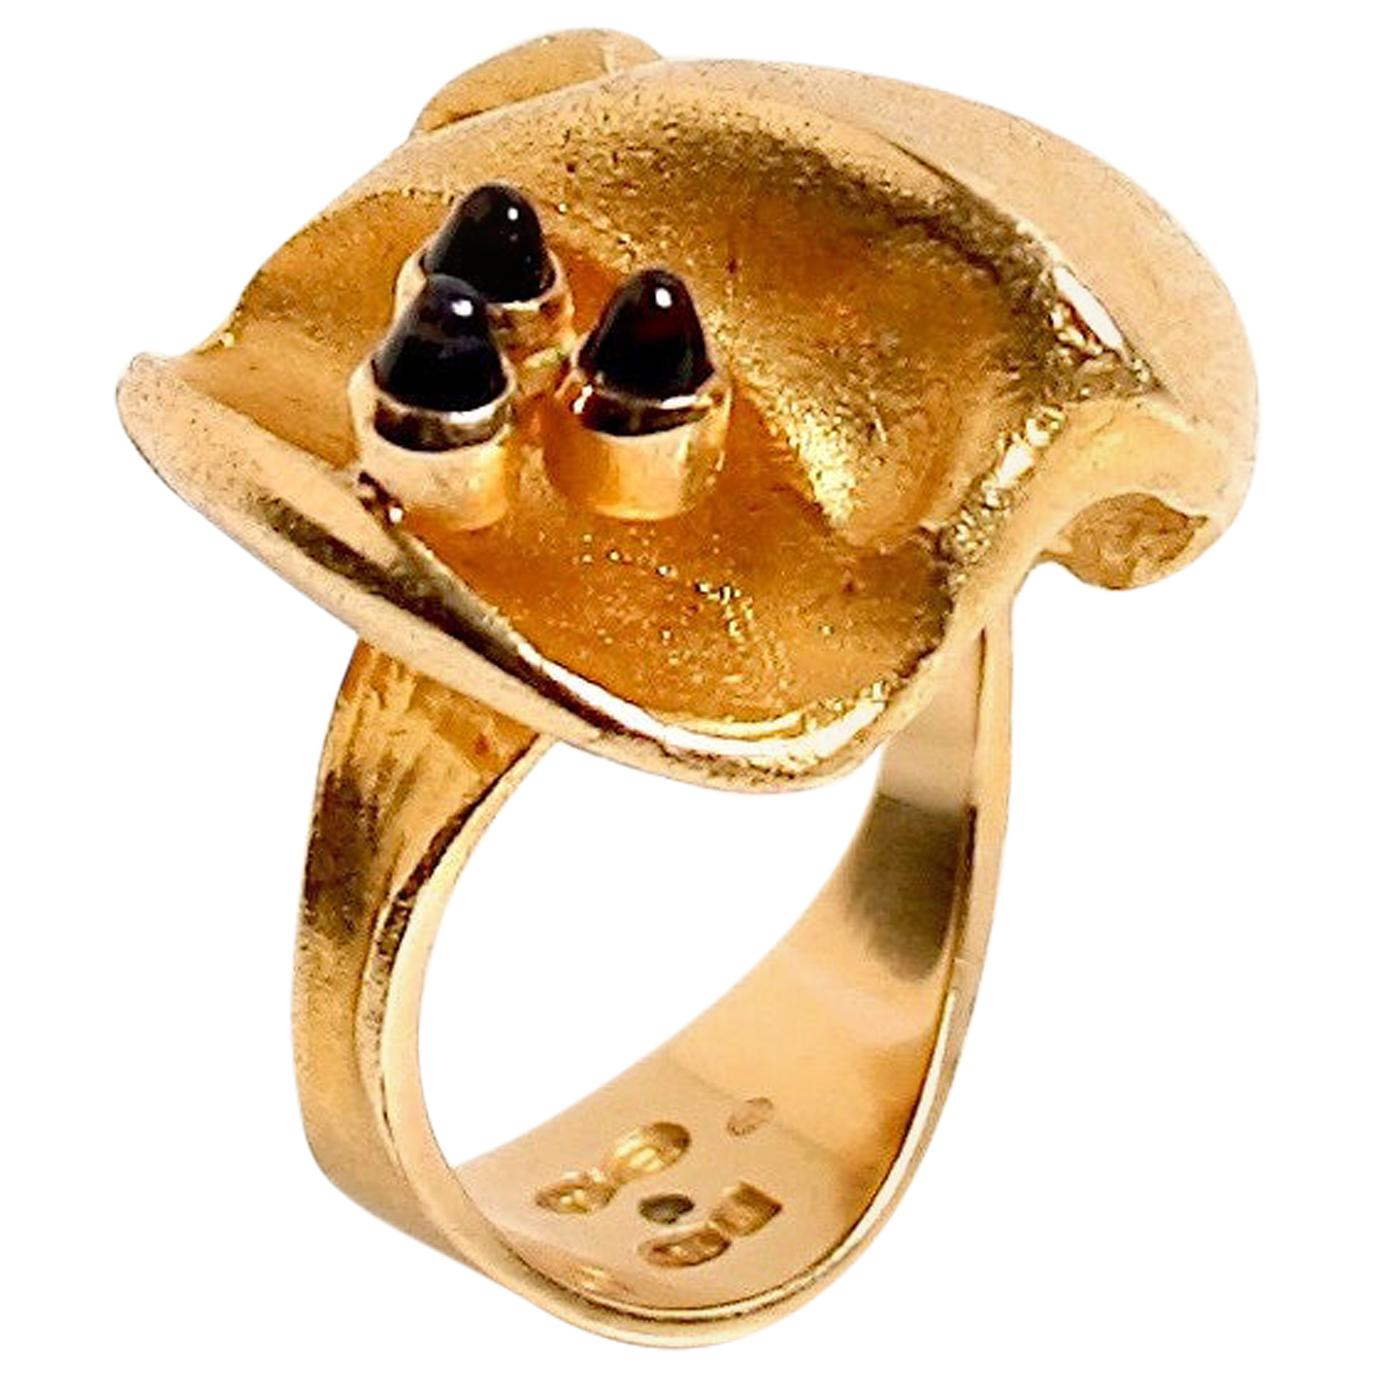 18 Karat Gold and Amethyst Ring Designed by Bjorn Weckstrom, Finland